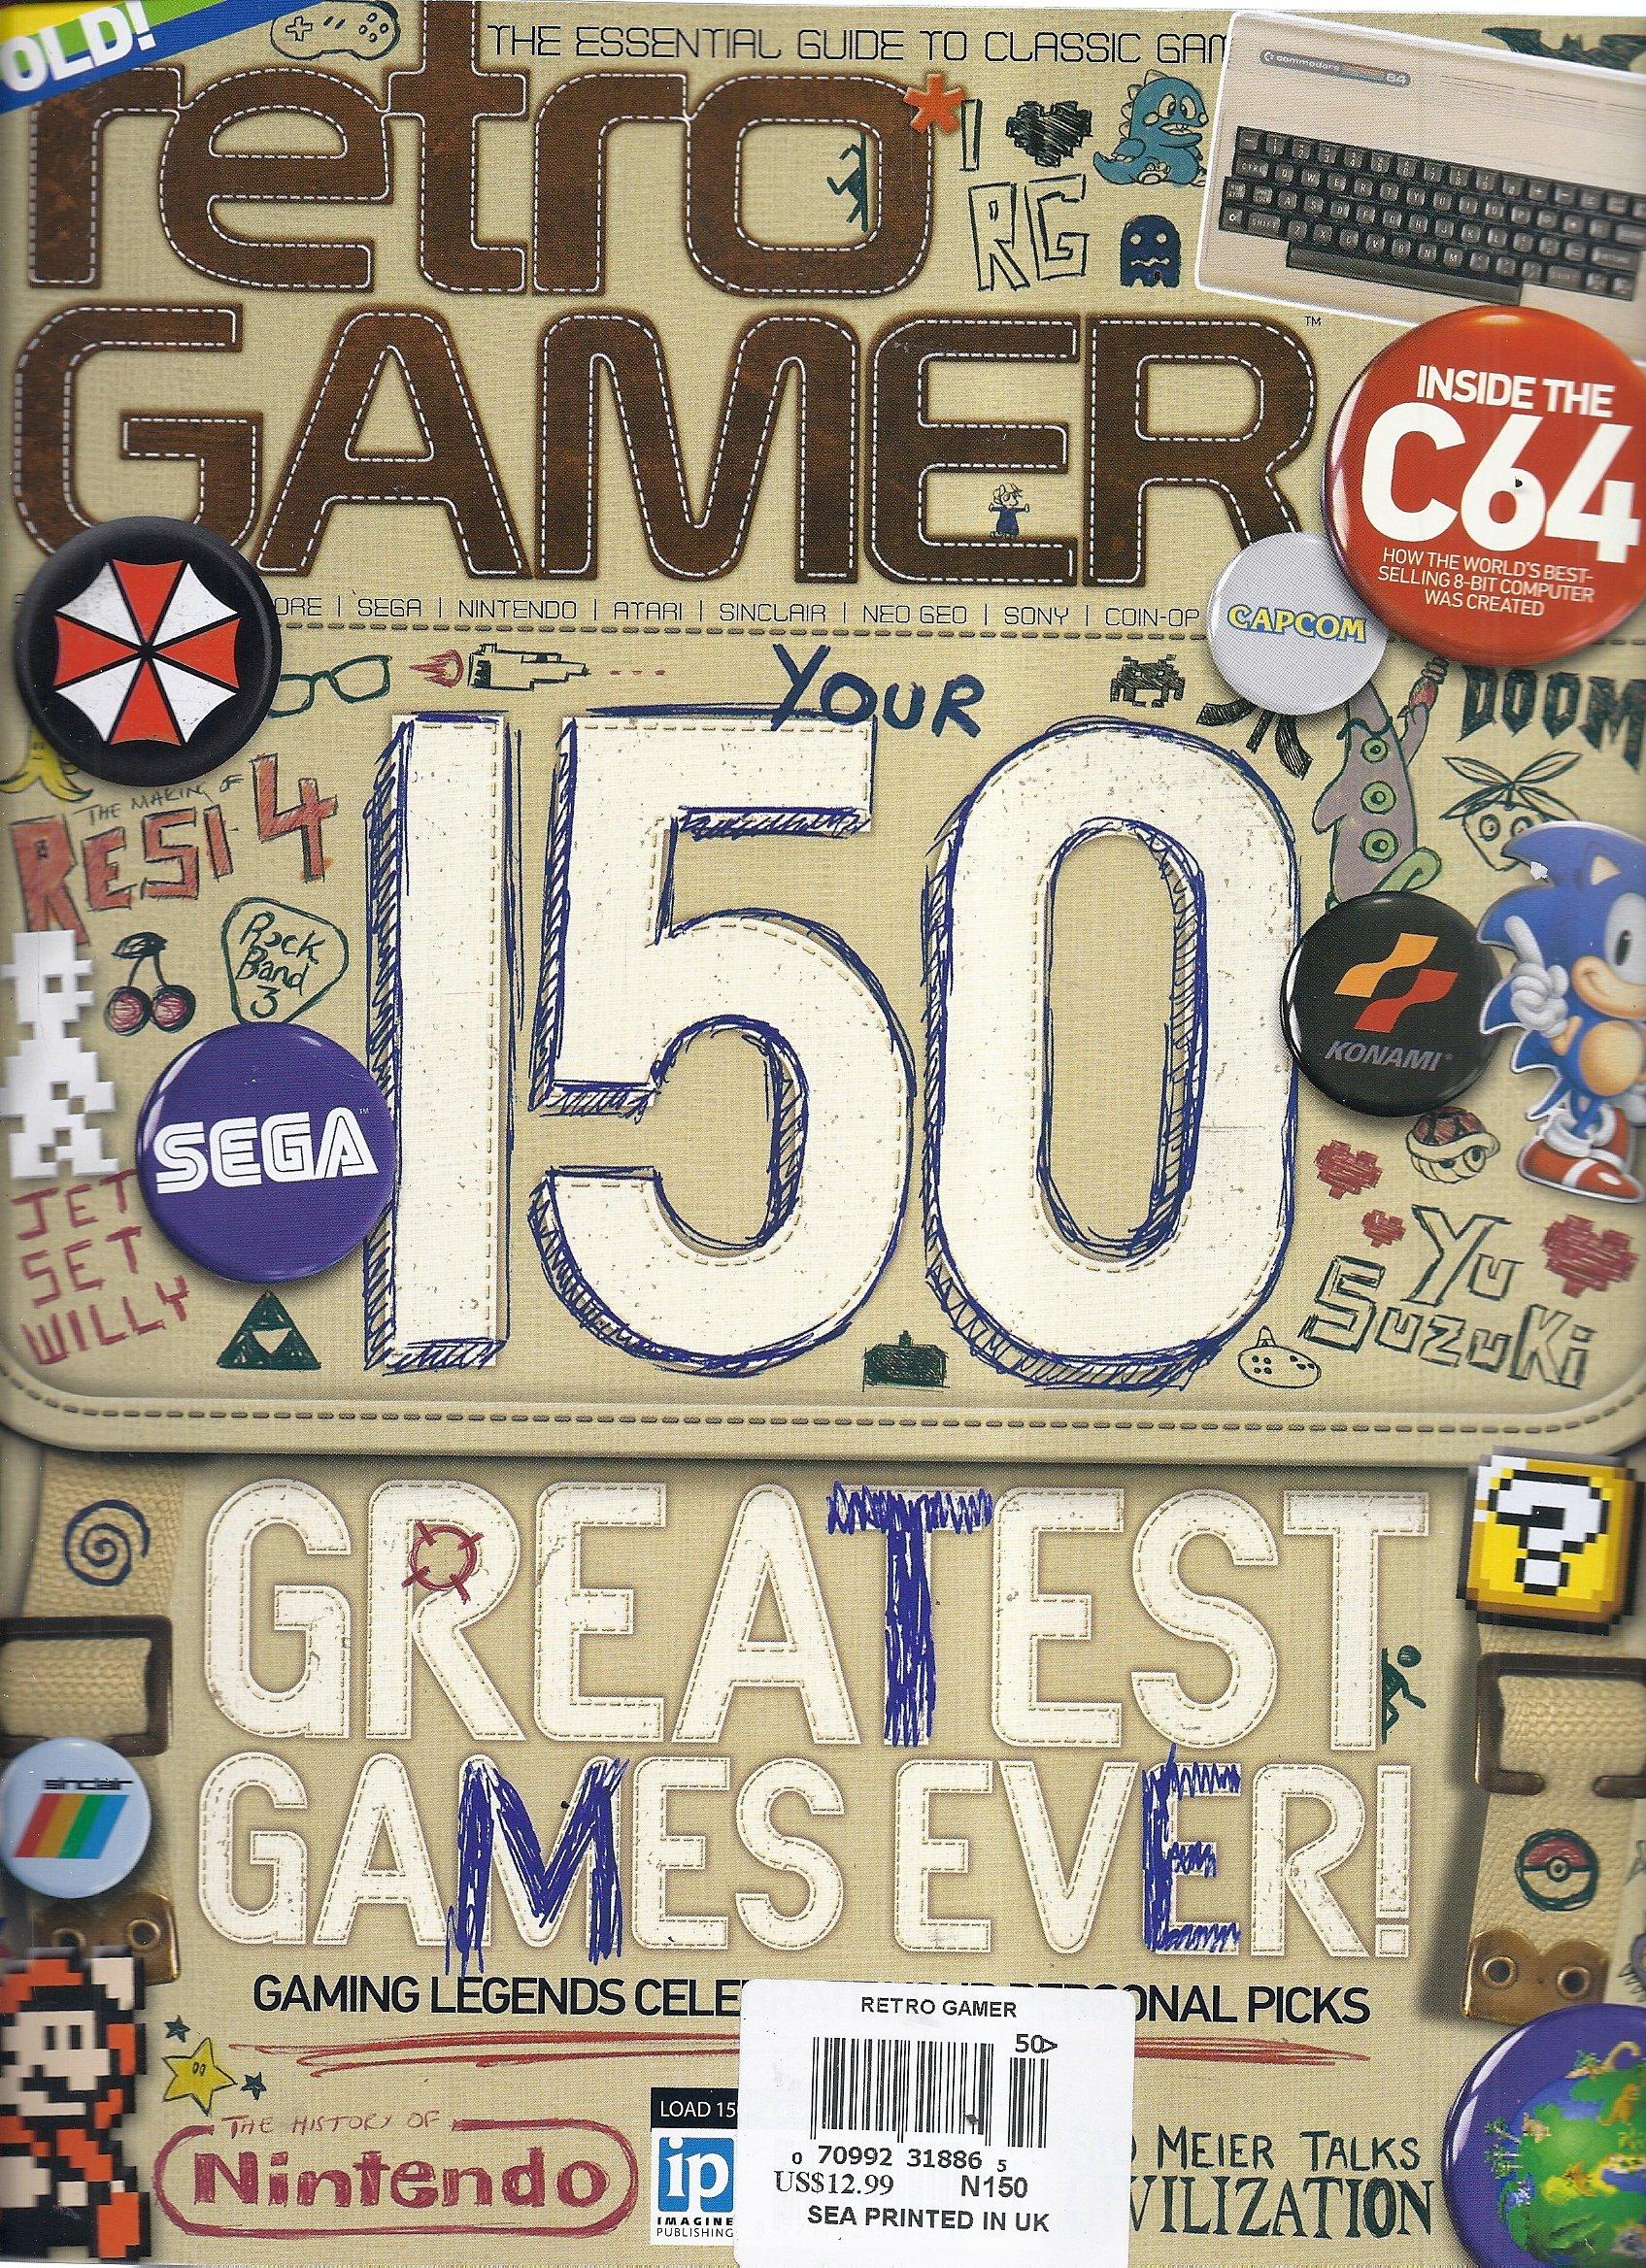 Retro Gamer Magazine (#150 - Your 150 Greatest Games Ever